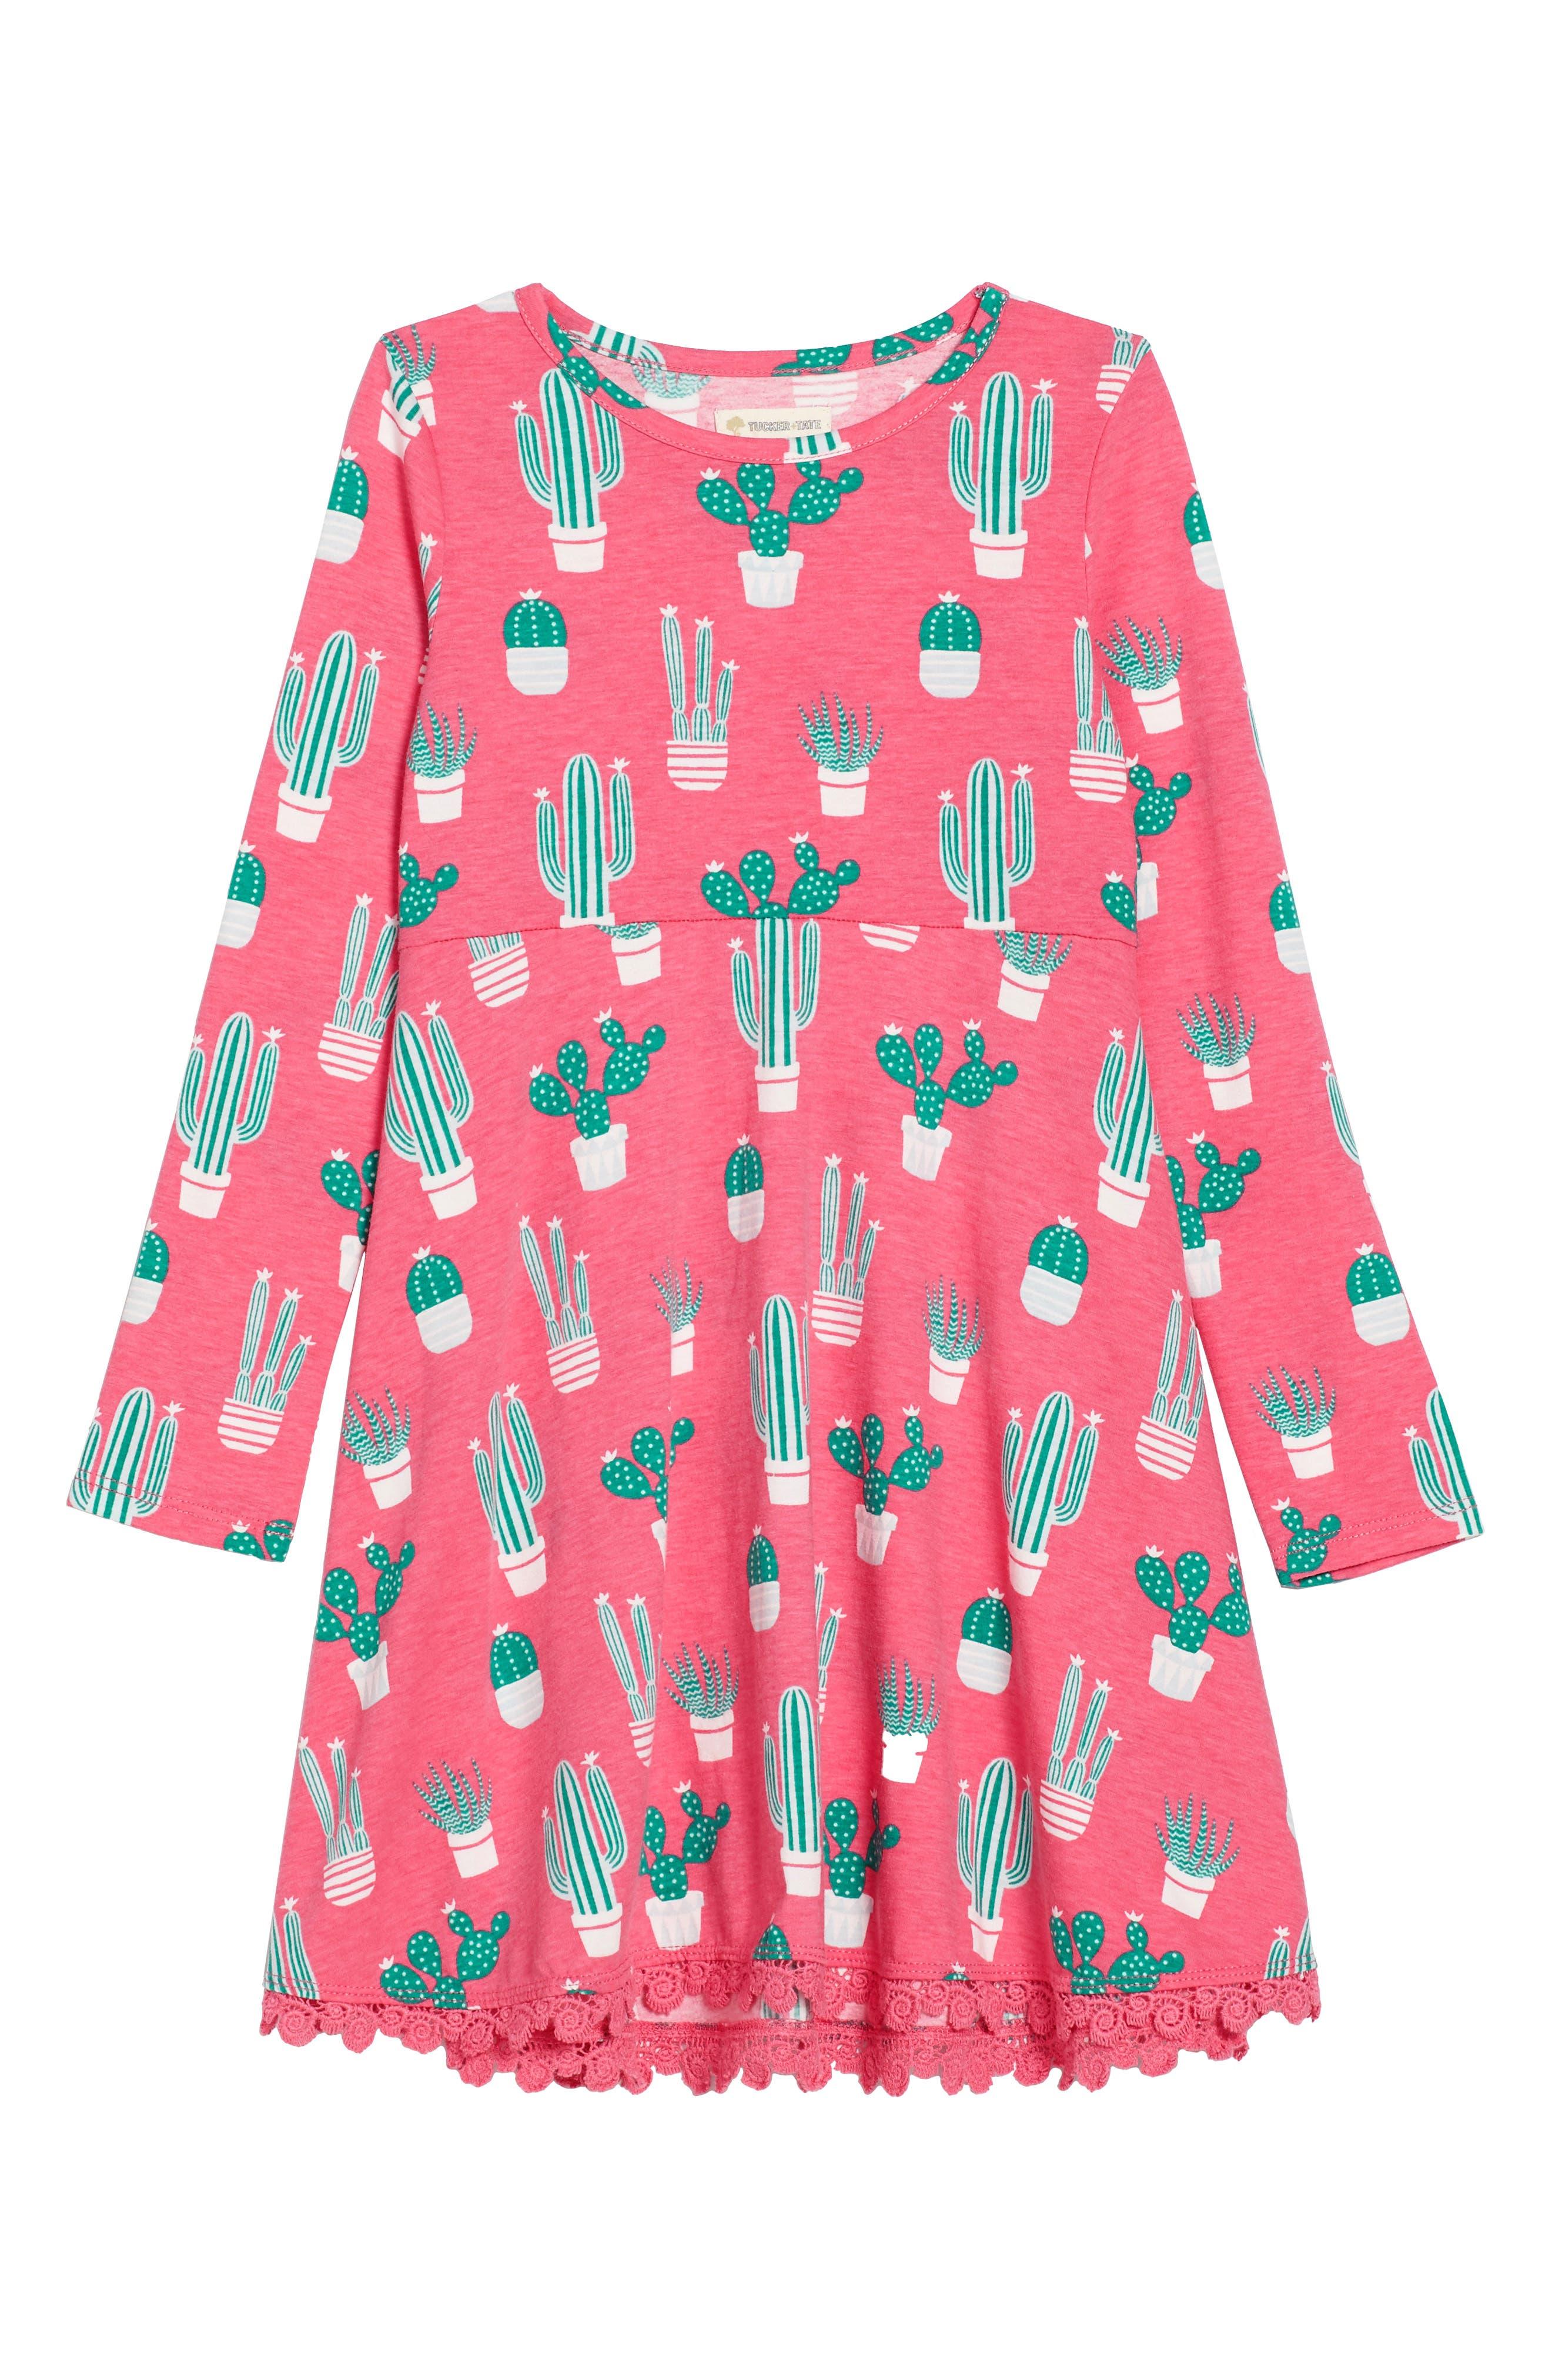 Alternate Image 1 Selected - Tucker + Tate Print Knit Dress (Toddler Girls, Little Girls & Big Girls)